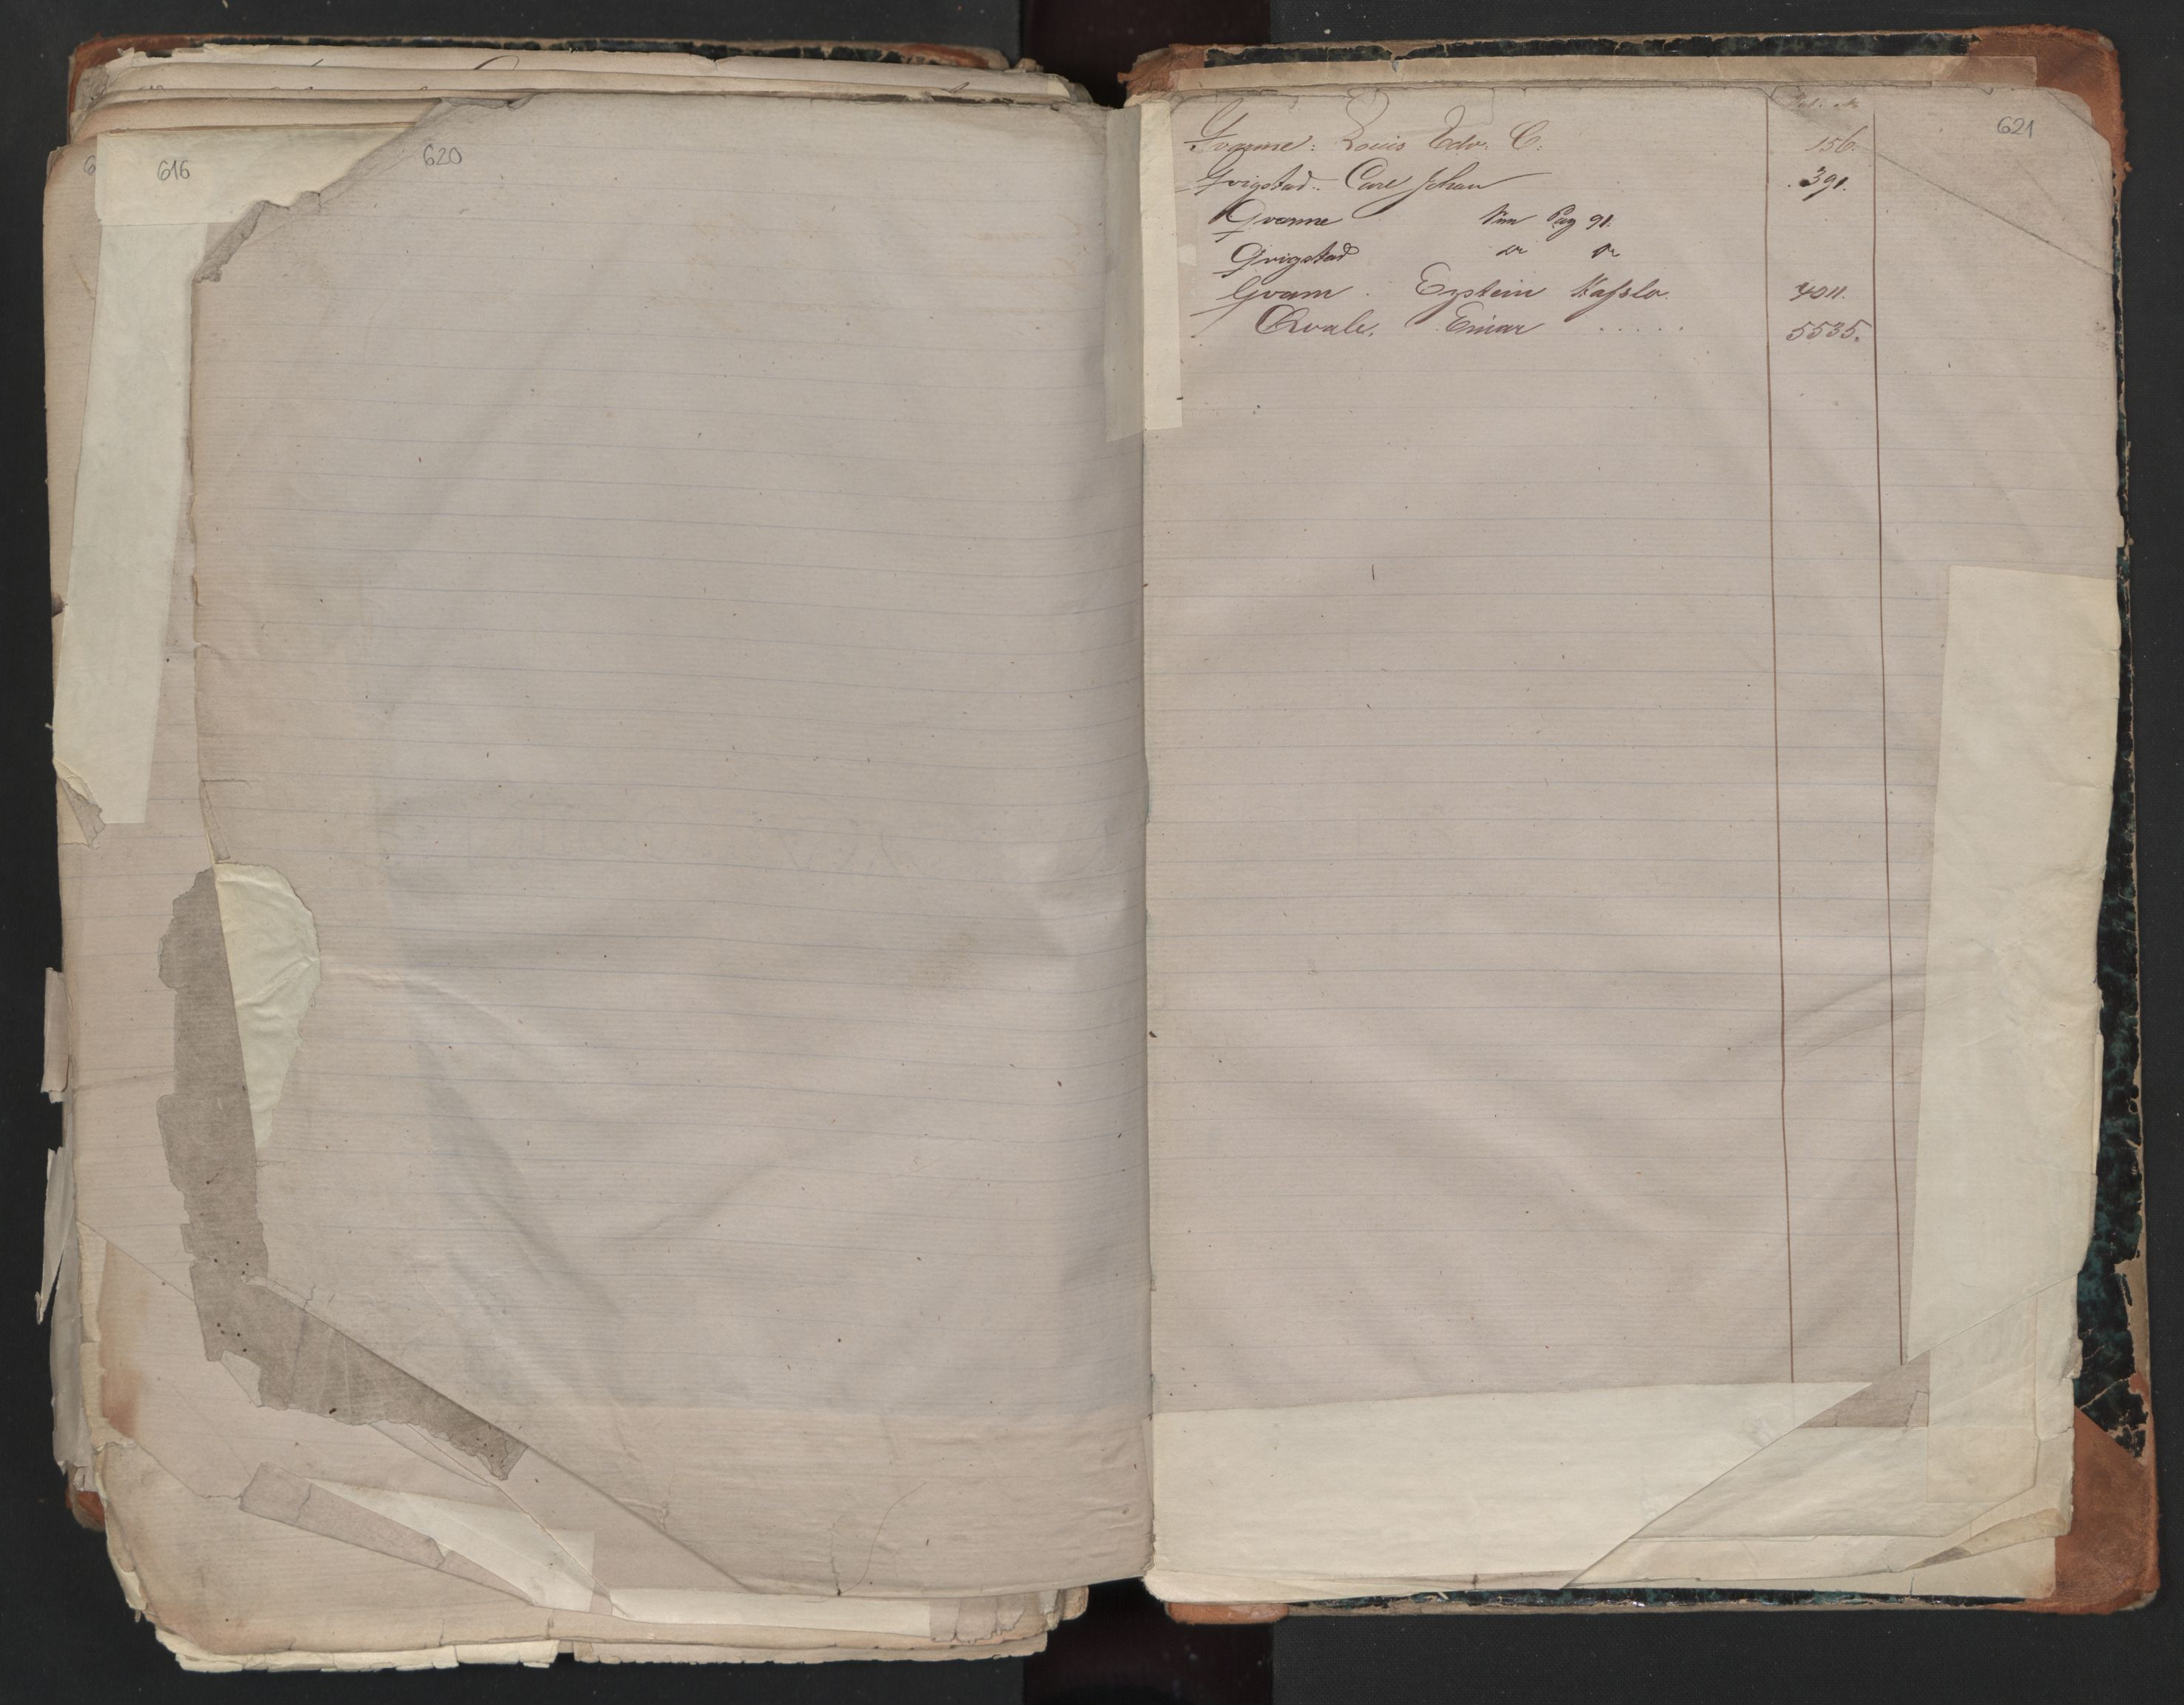 SAO, Oslo sjømannskontor, F/Fa/L0001: Register for Kristiania krets, 1866-1891, s. 620-621